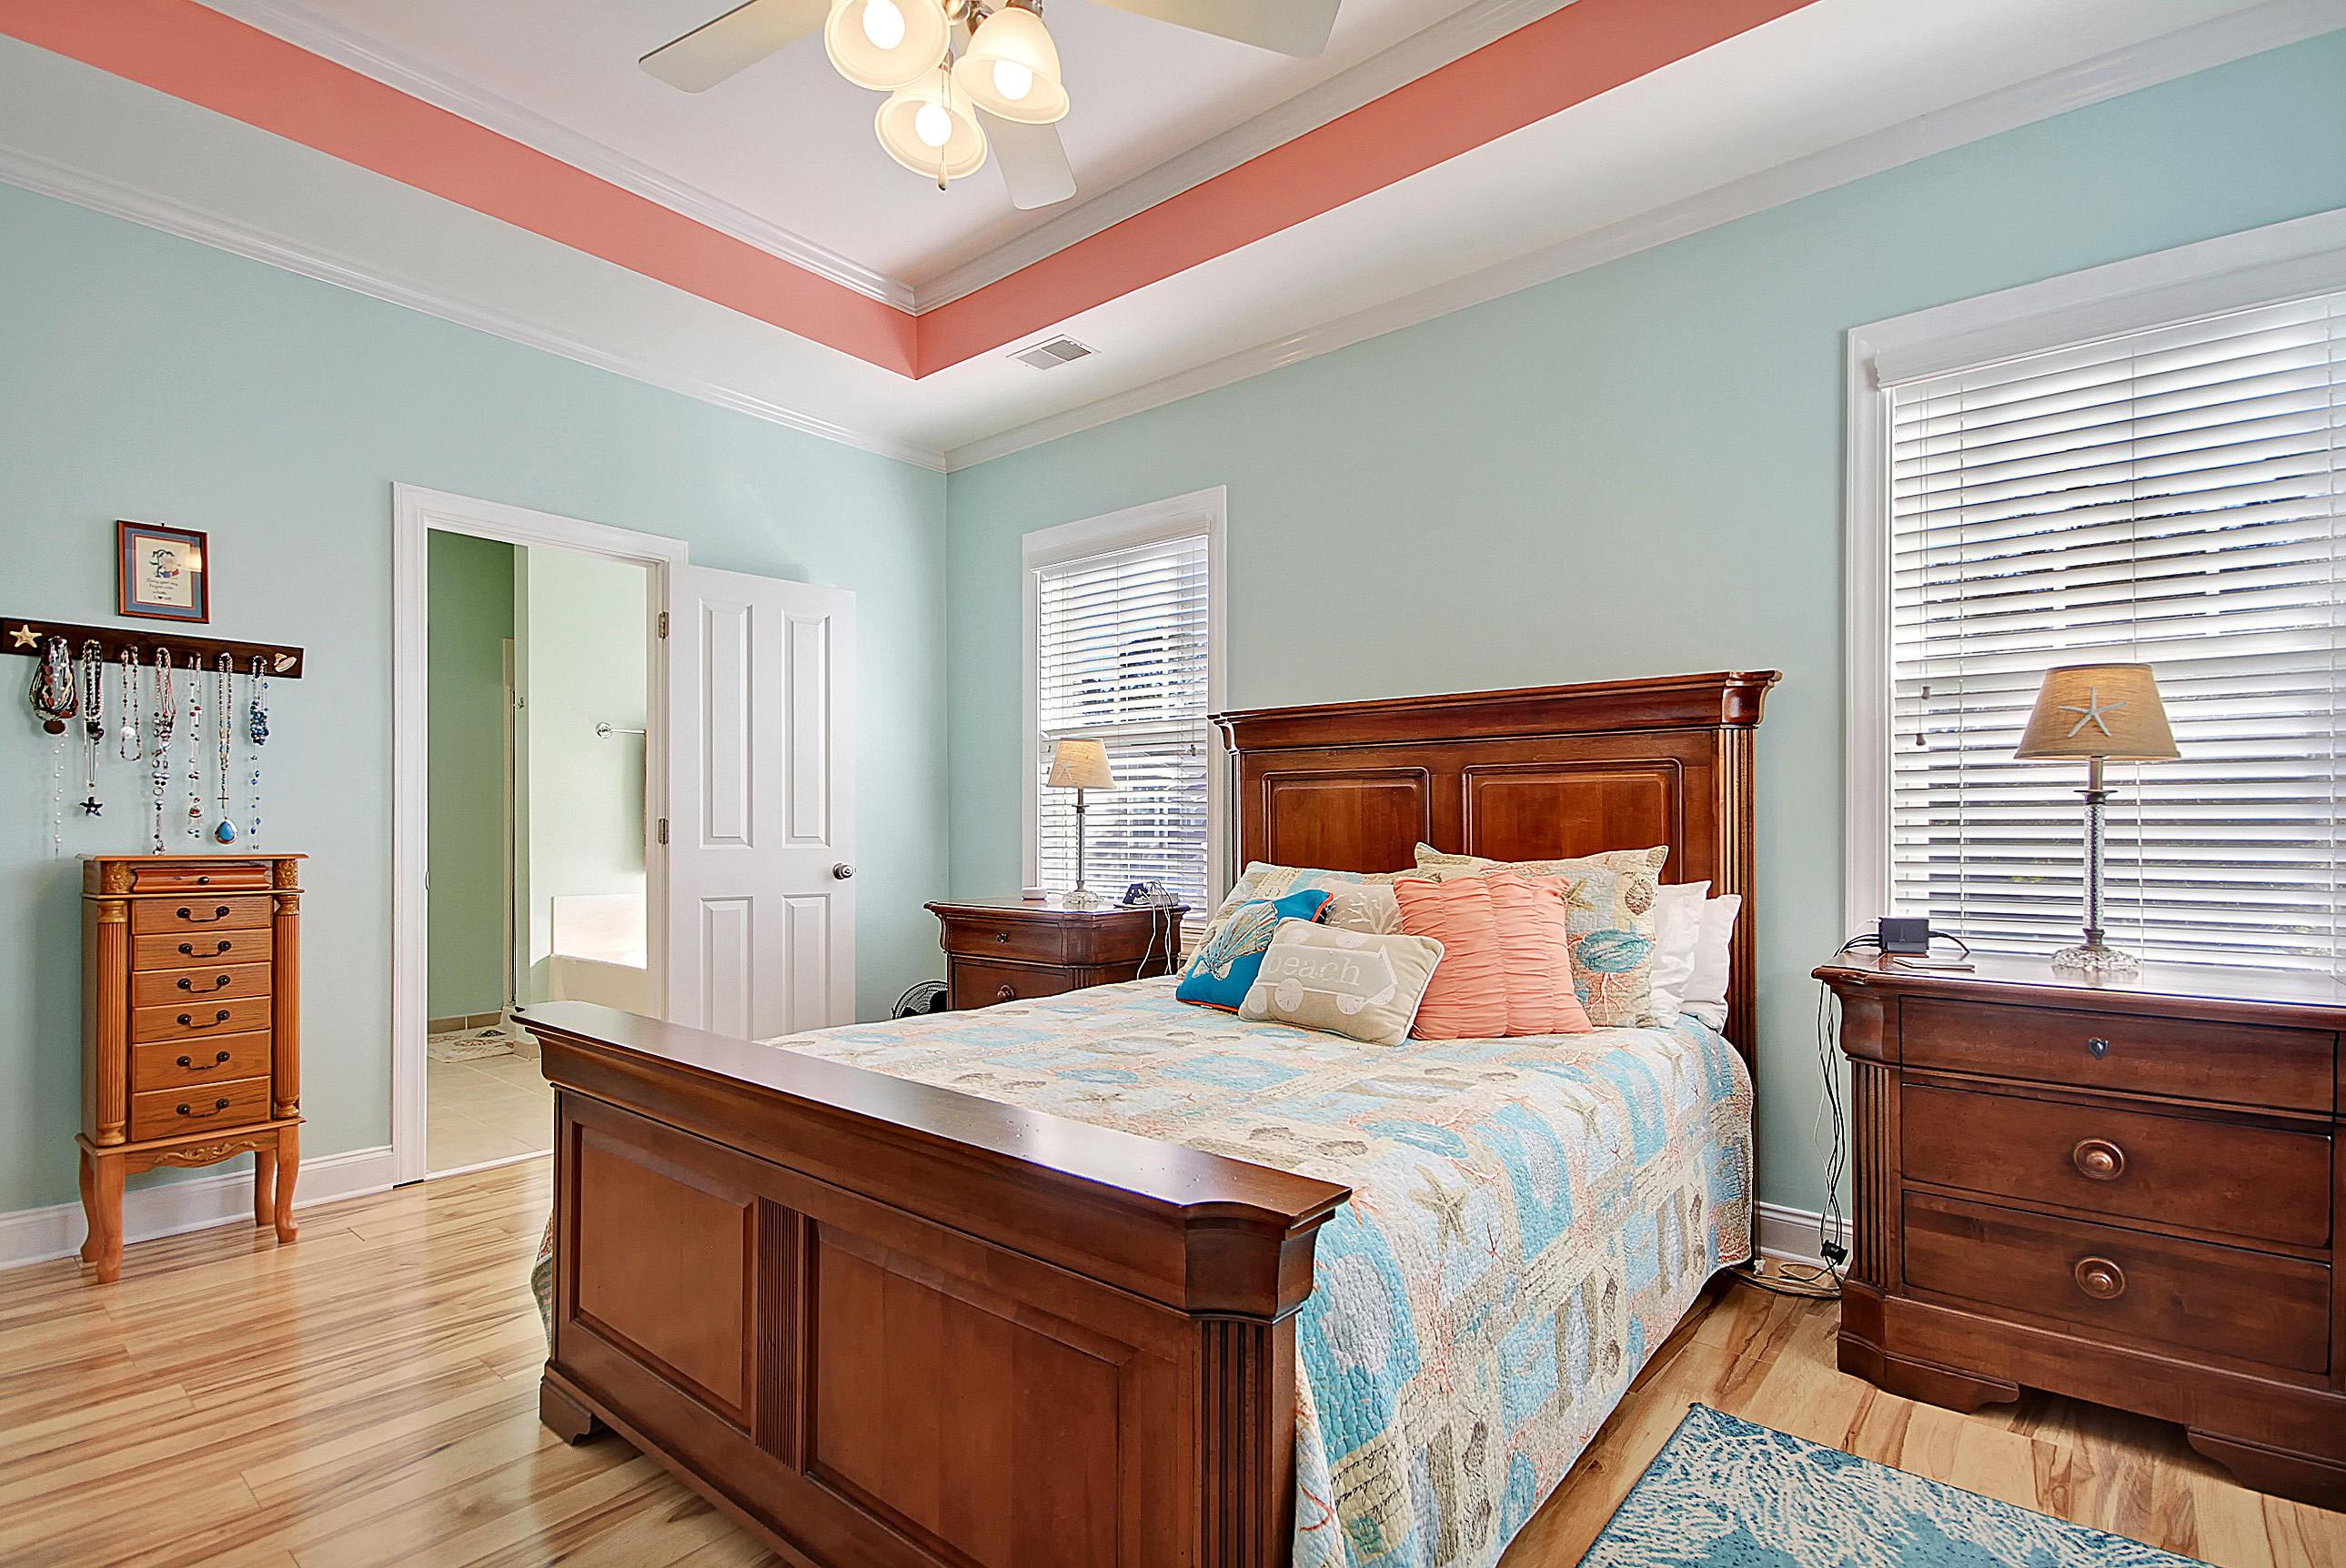 Indigo Palms Homes For Sale - 8535 Royal Palms, North Charleston, SC - 3